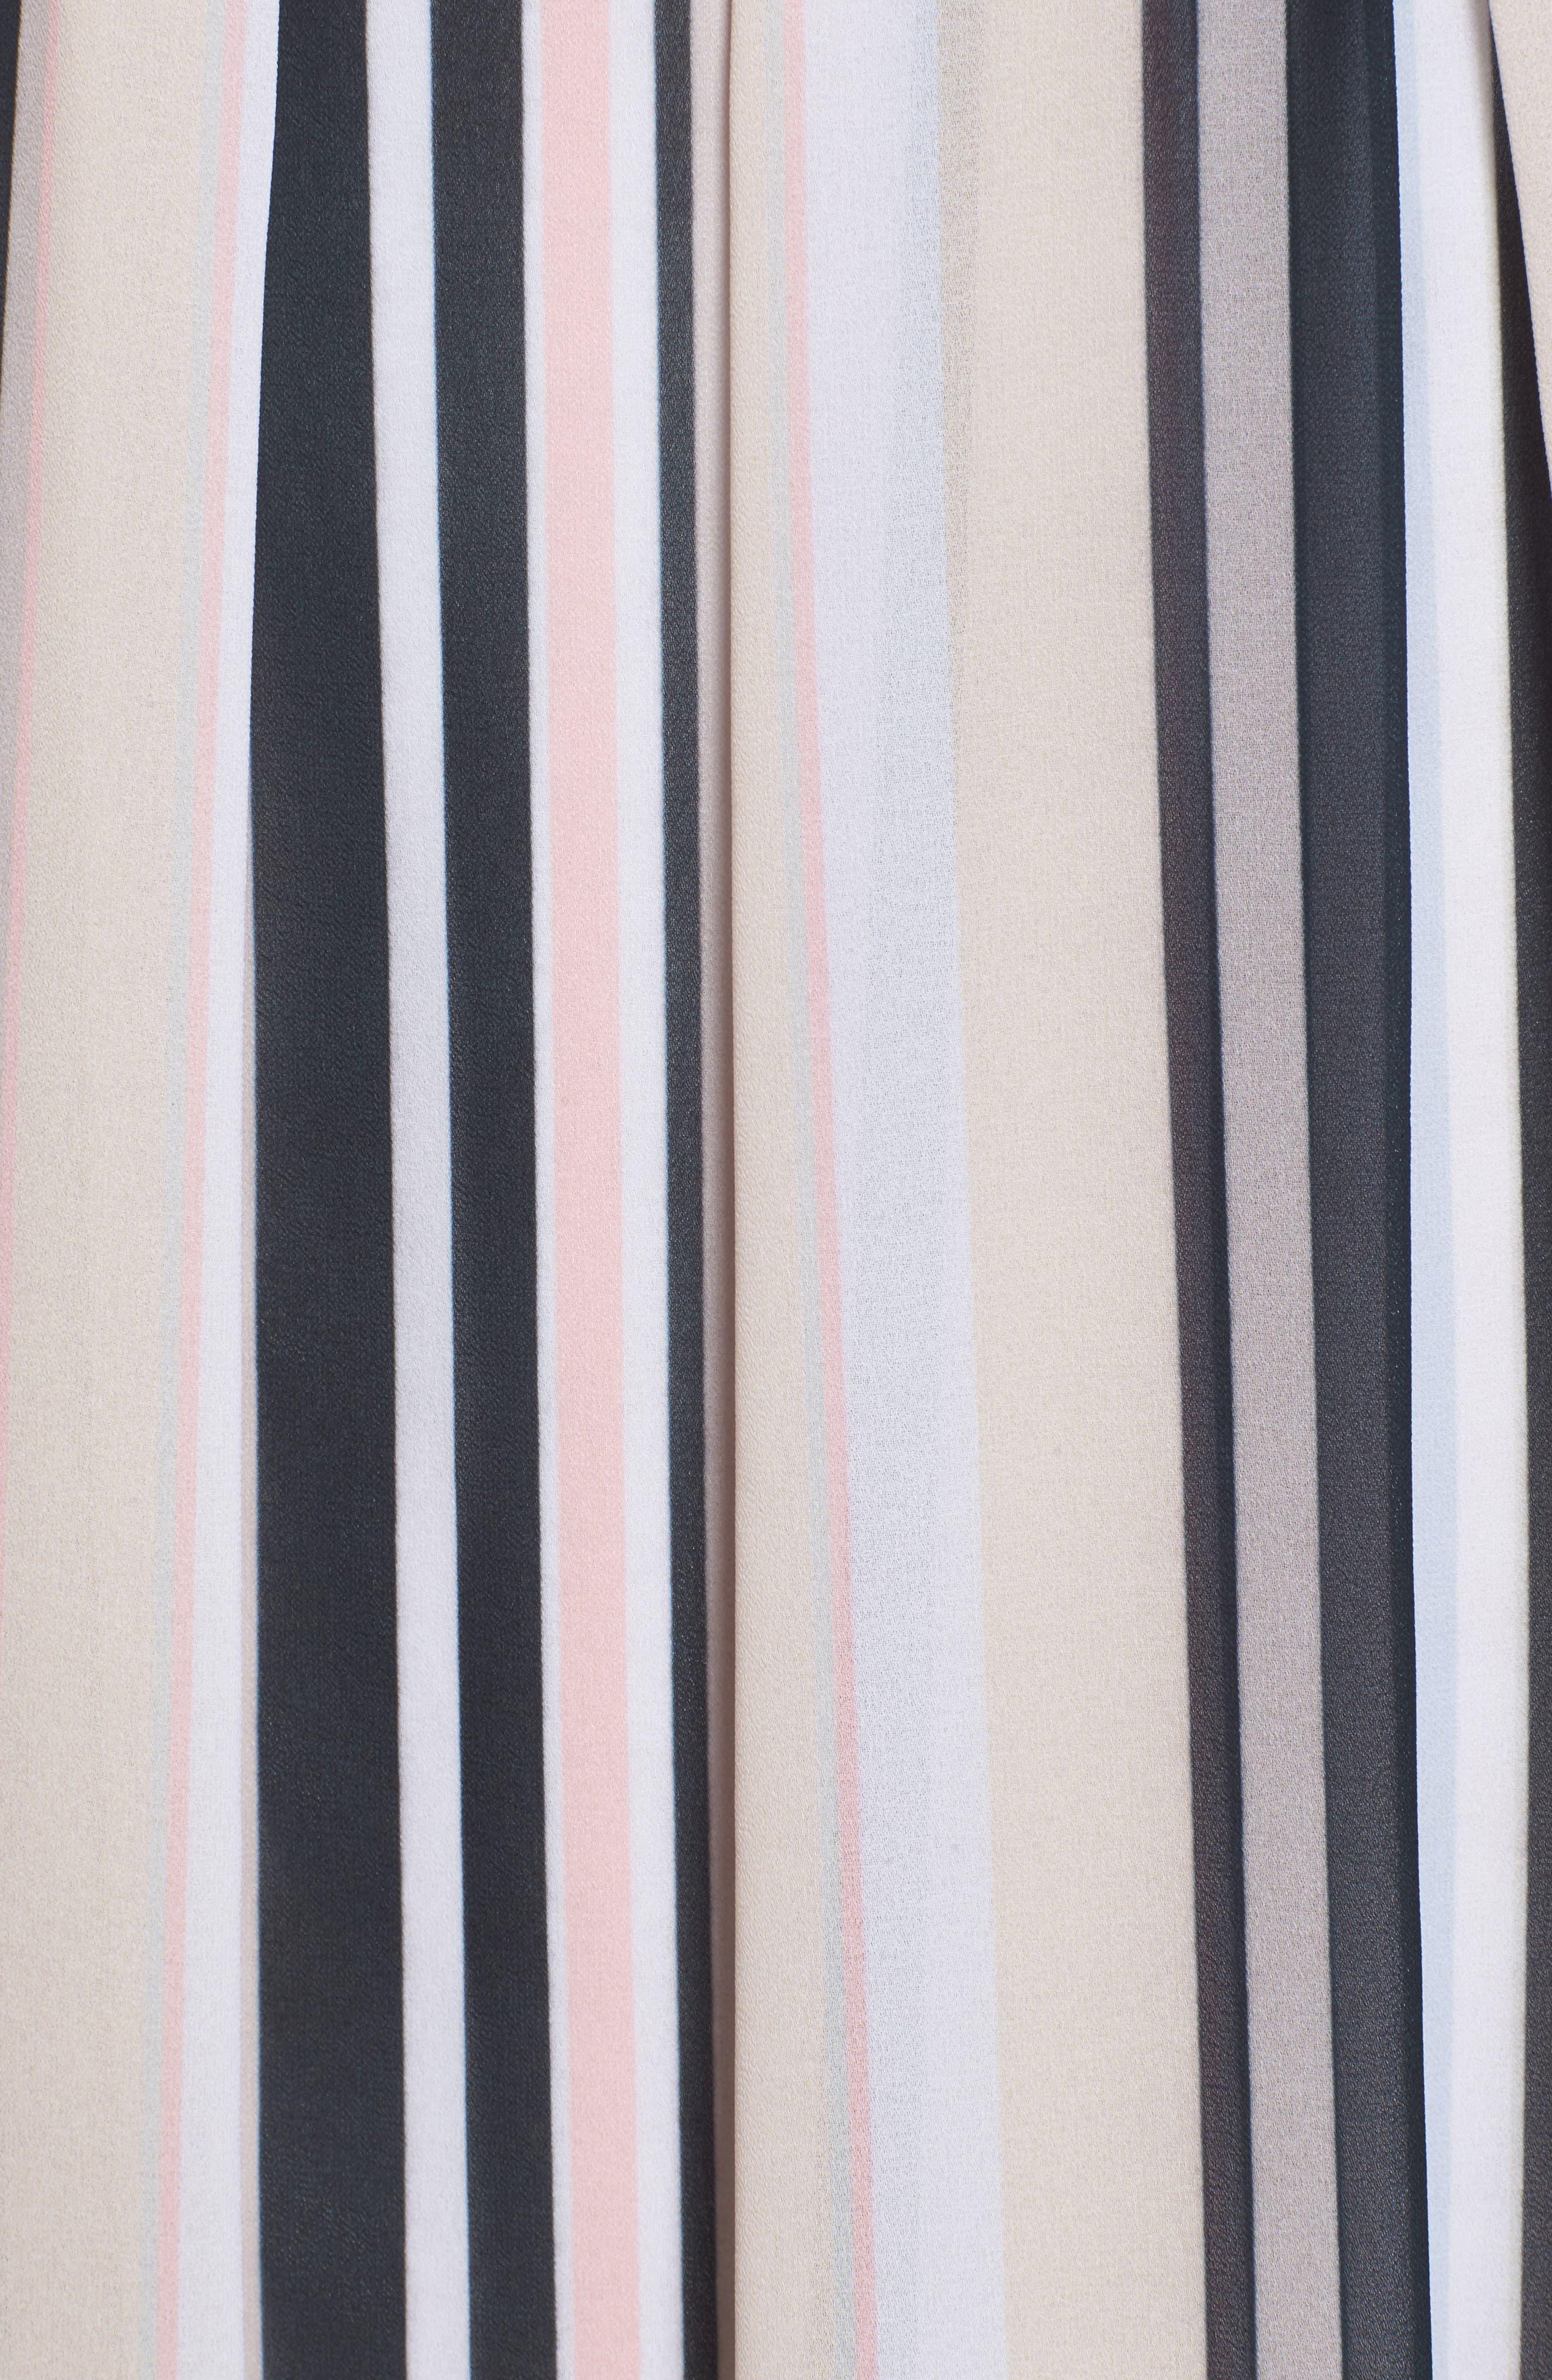 Stripe A-Line Skirt,                             Alternate thumbnail 5, color,                             Black/ Beach Combo